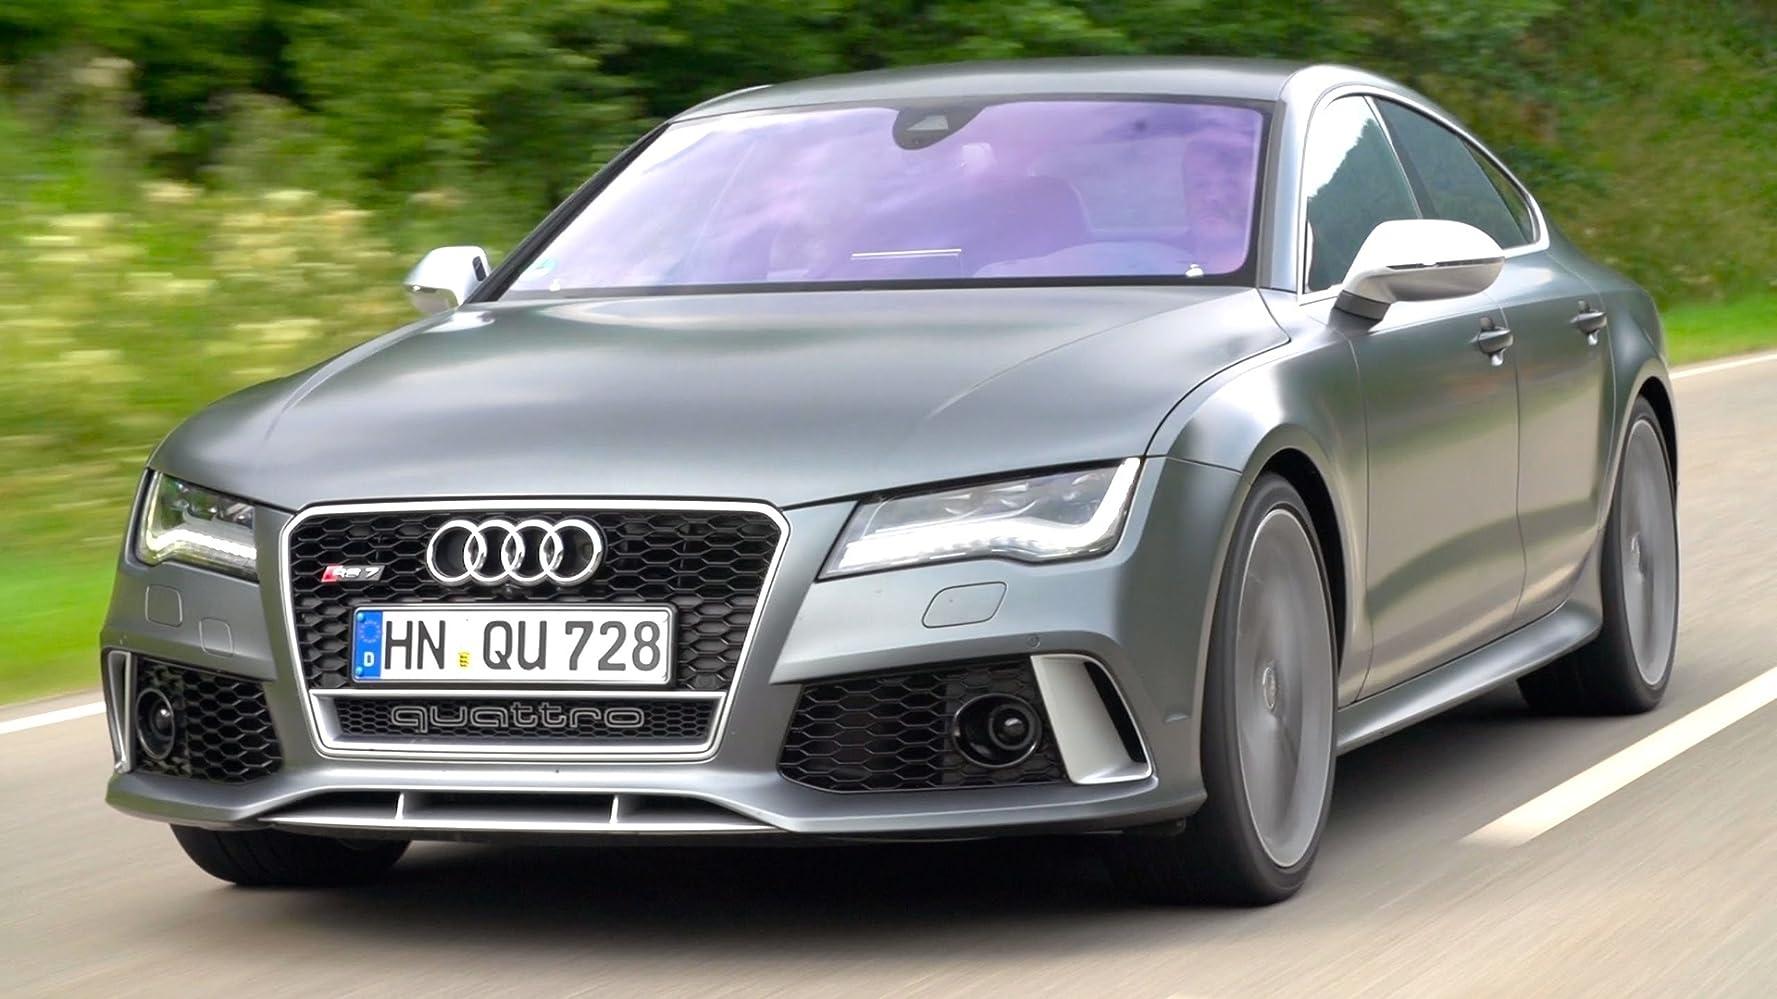 2014 Audi Rs7 Top Speed Bahnstorming In Germany 2013